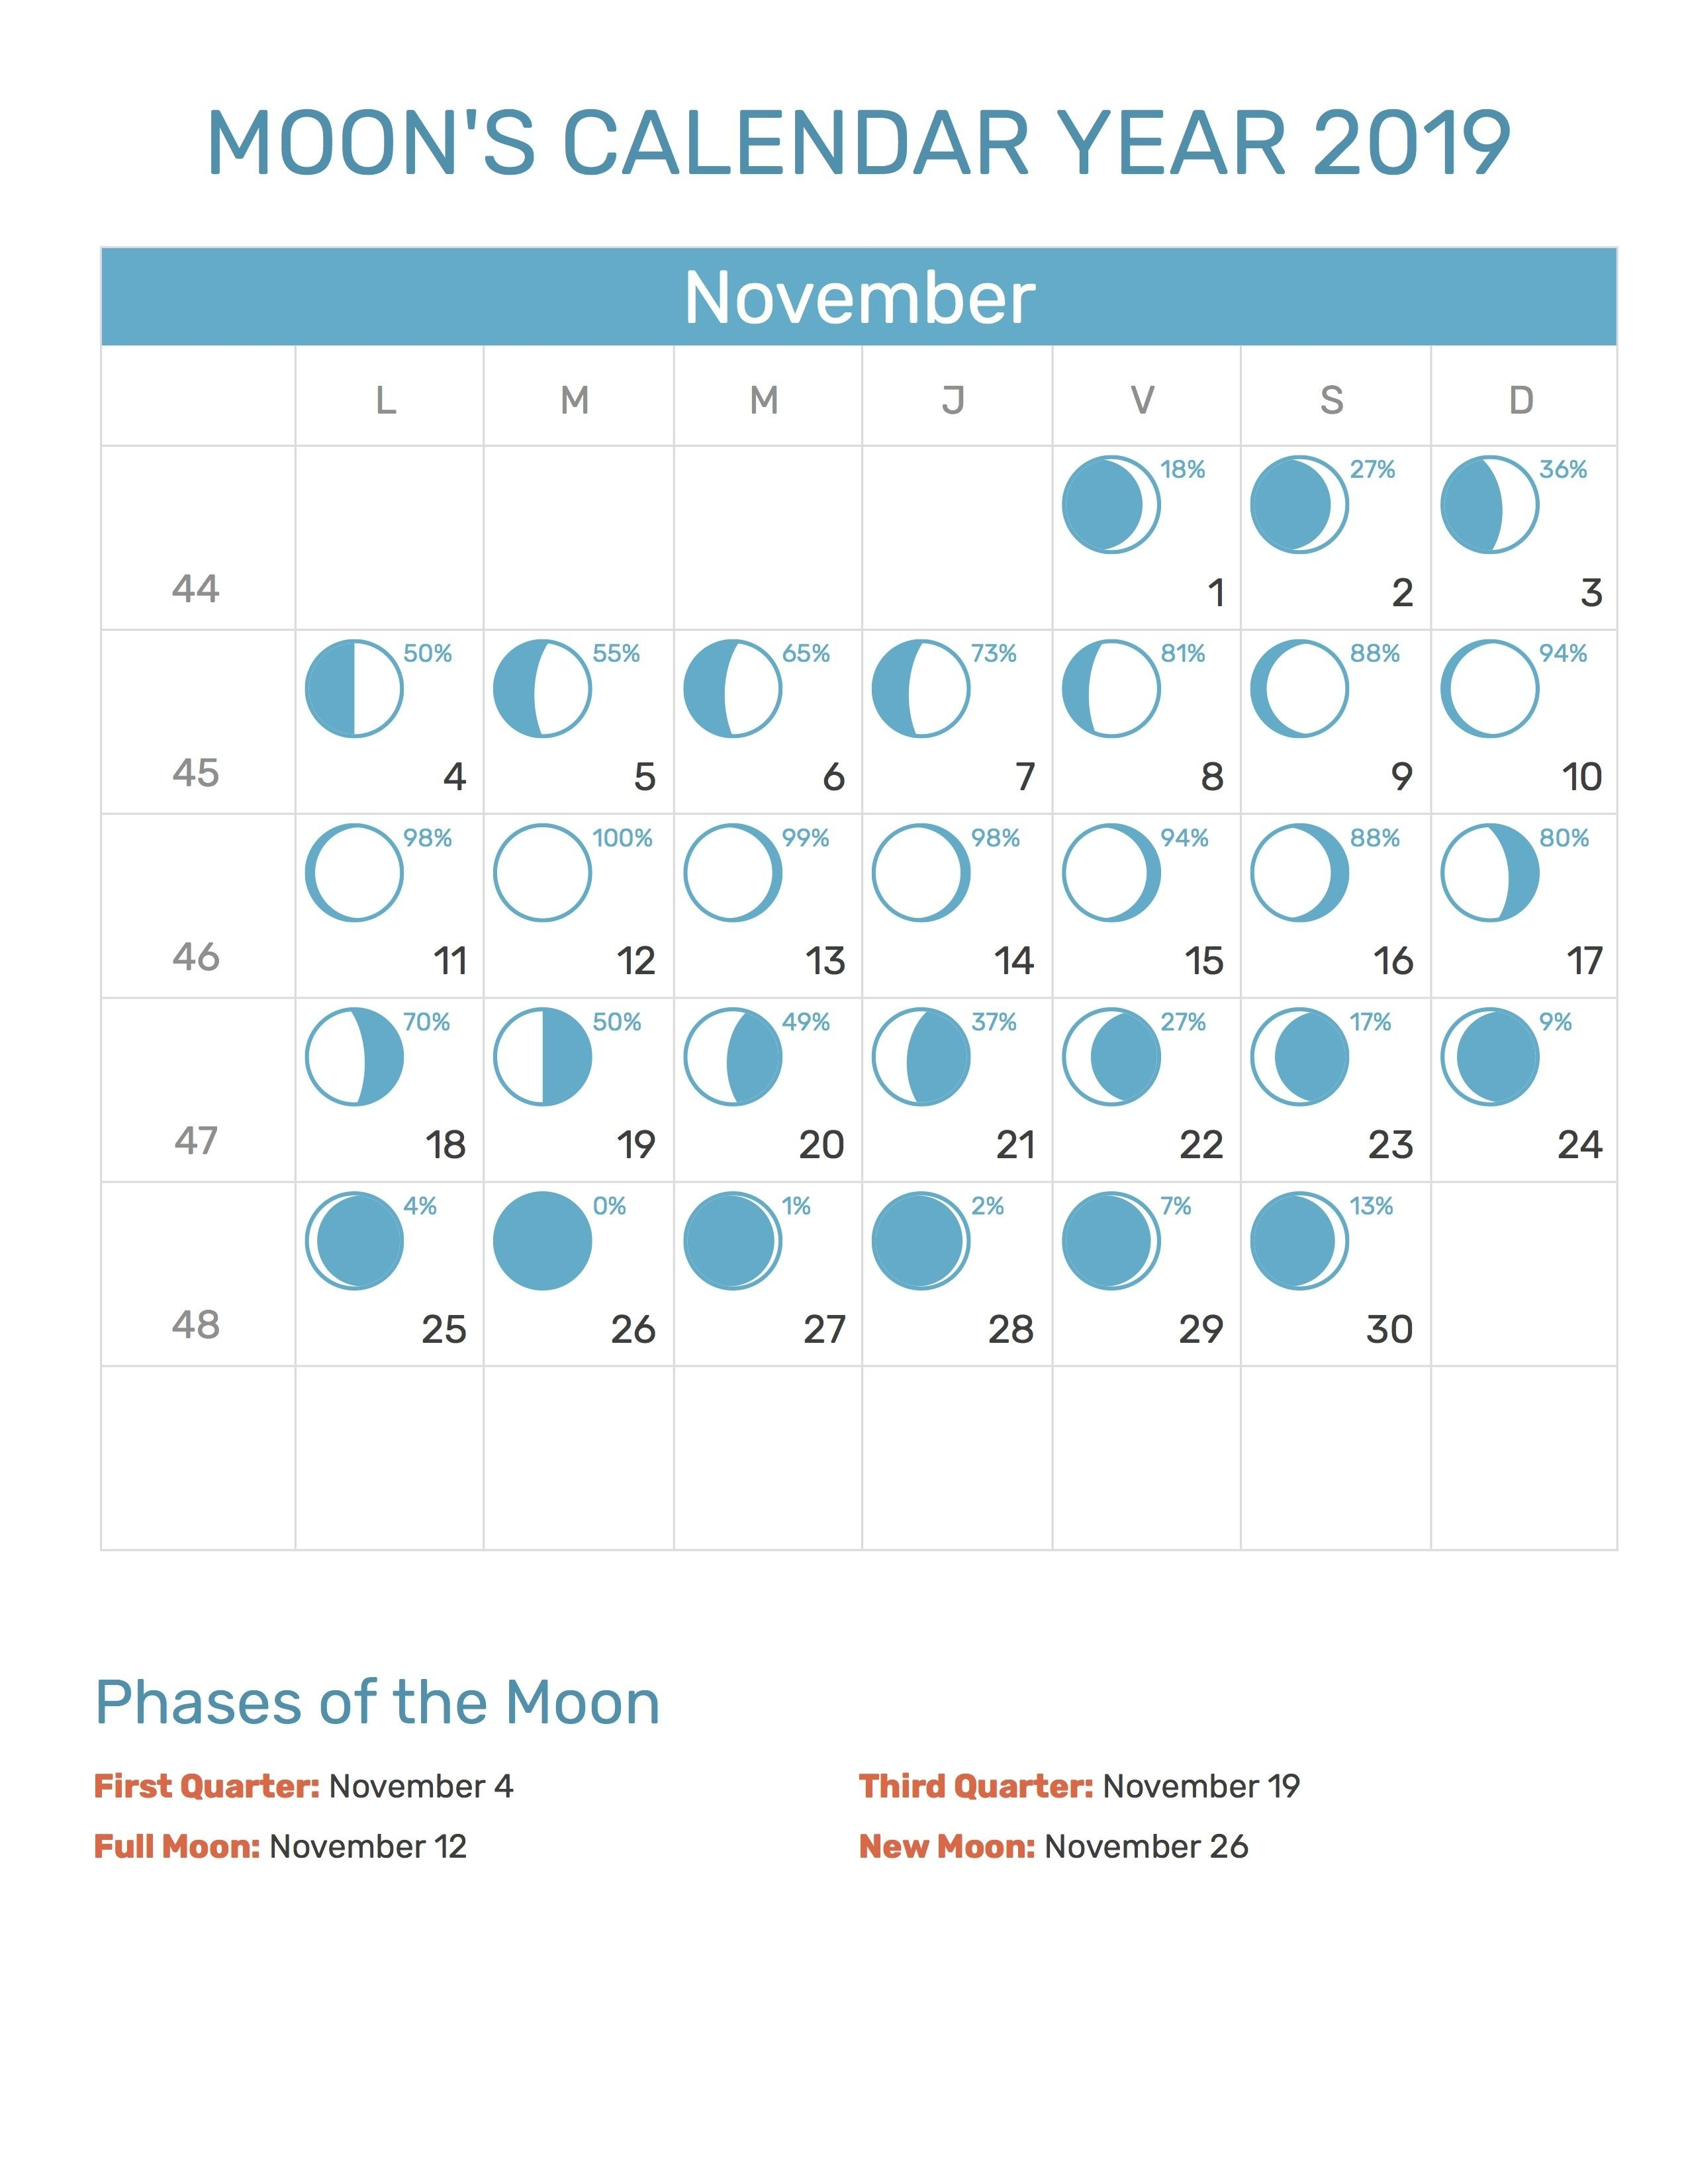 20+ Lunar Calendar 2021 - Free Download Printable Calendar Templates ️ Lunar Calendar September 2021